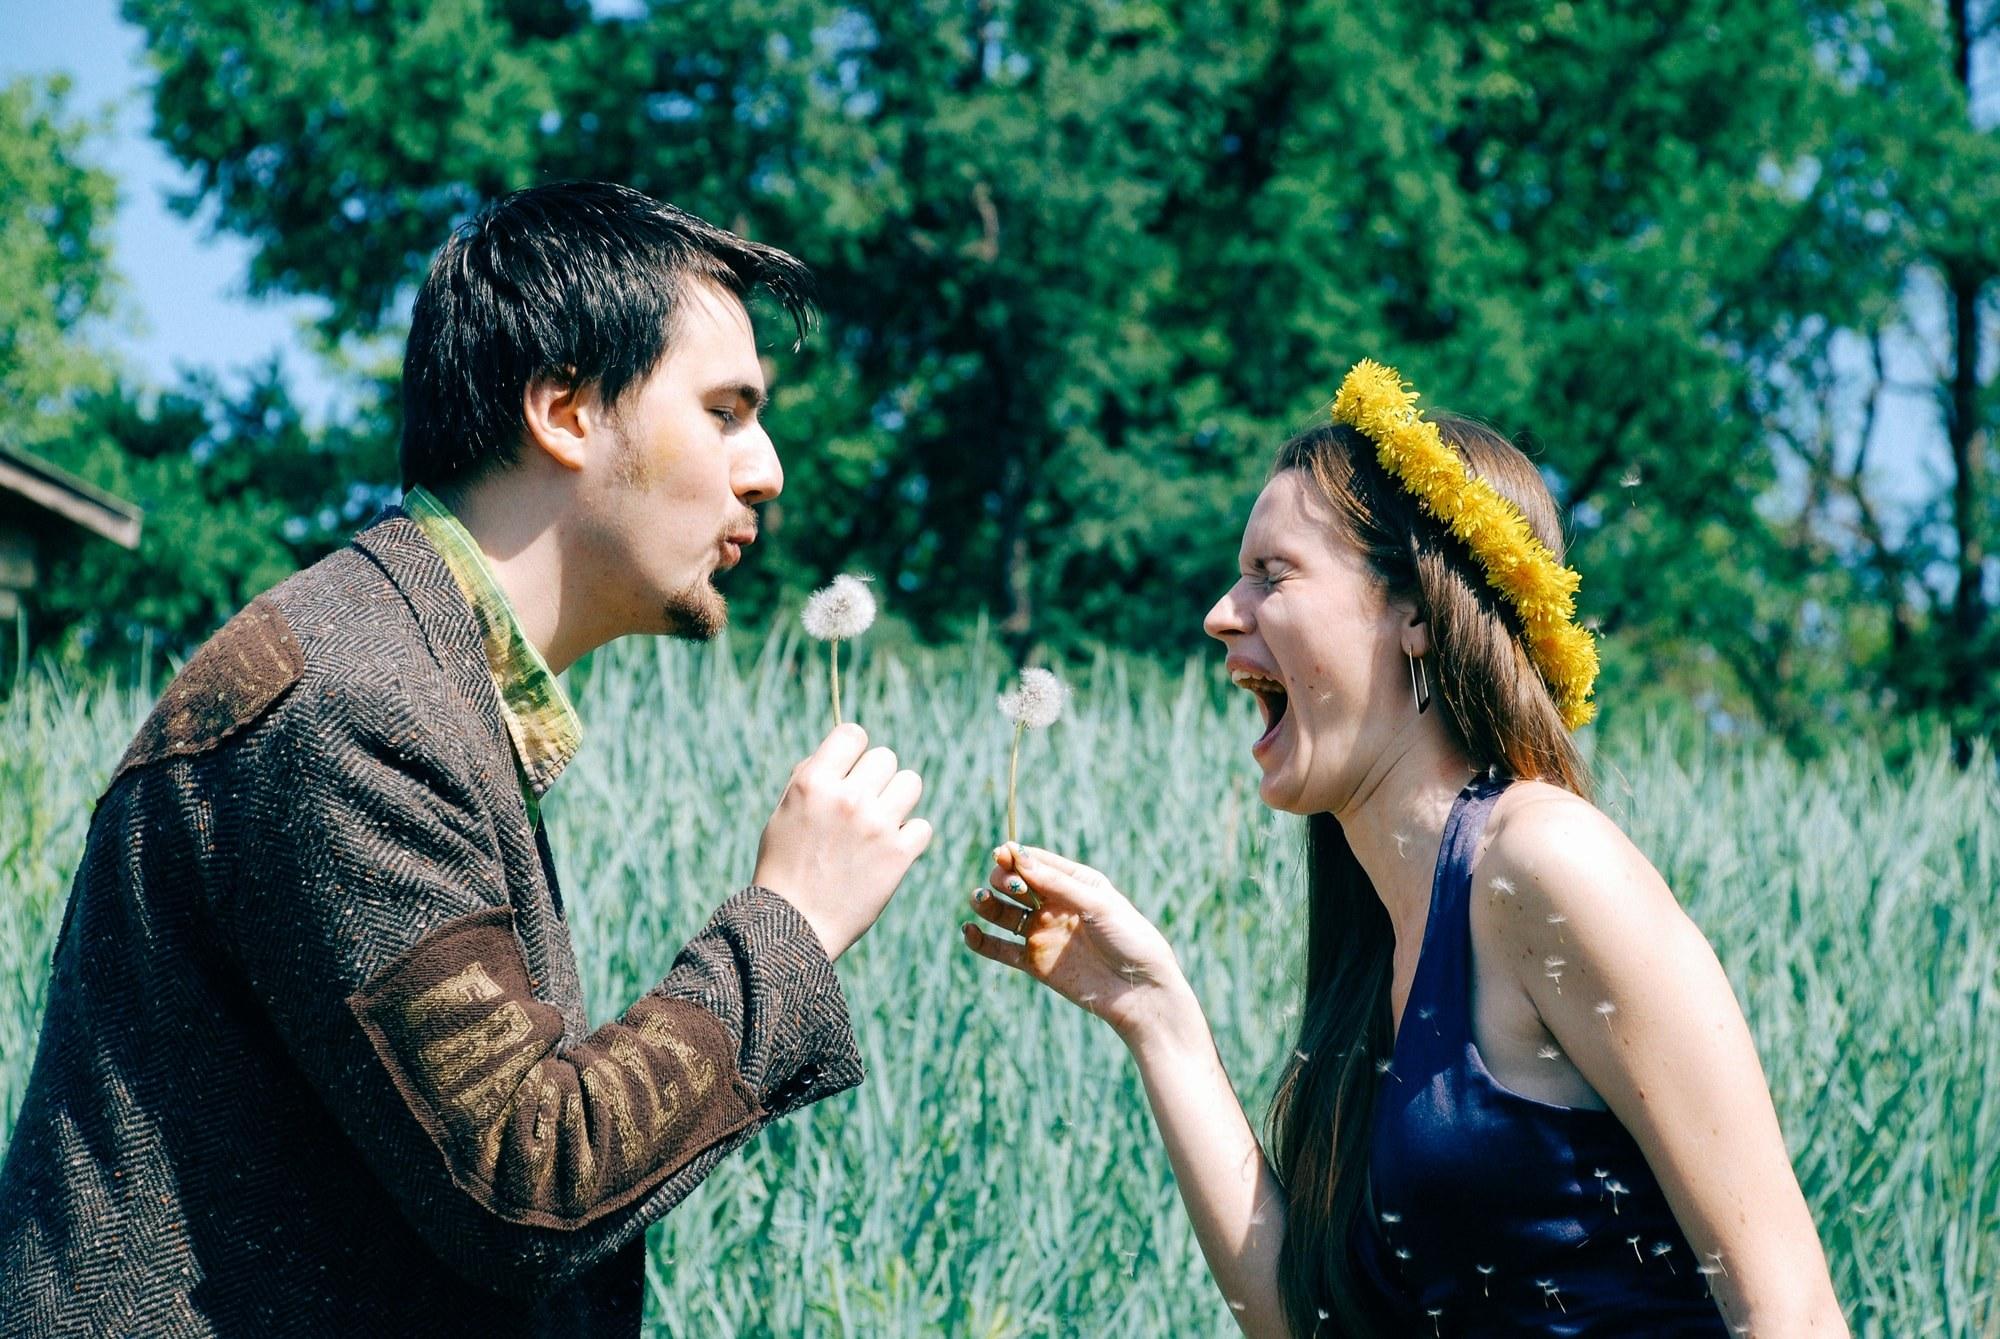 Пара дуют одуванчики - Фотограф Киев - Женя Лайт